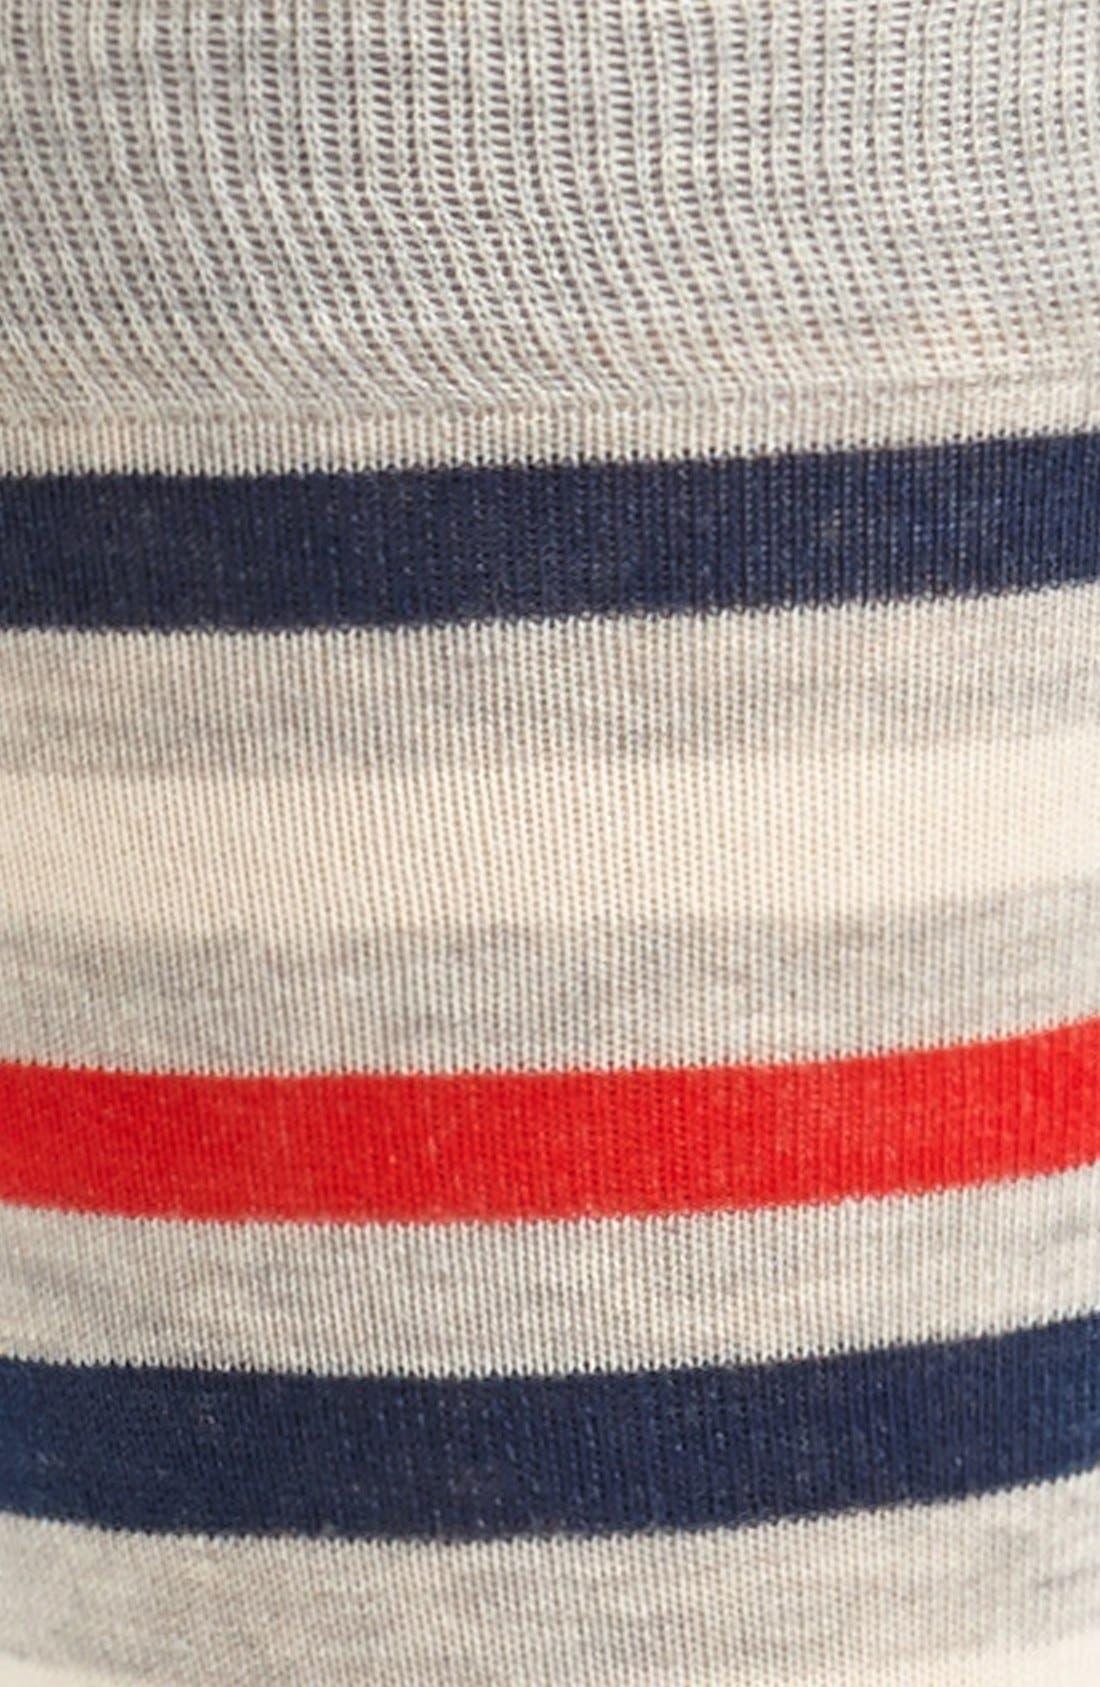 Alternate Image 2  - Etiquette Clothiers 'Crosswalk' Socks